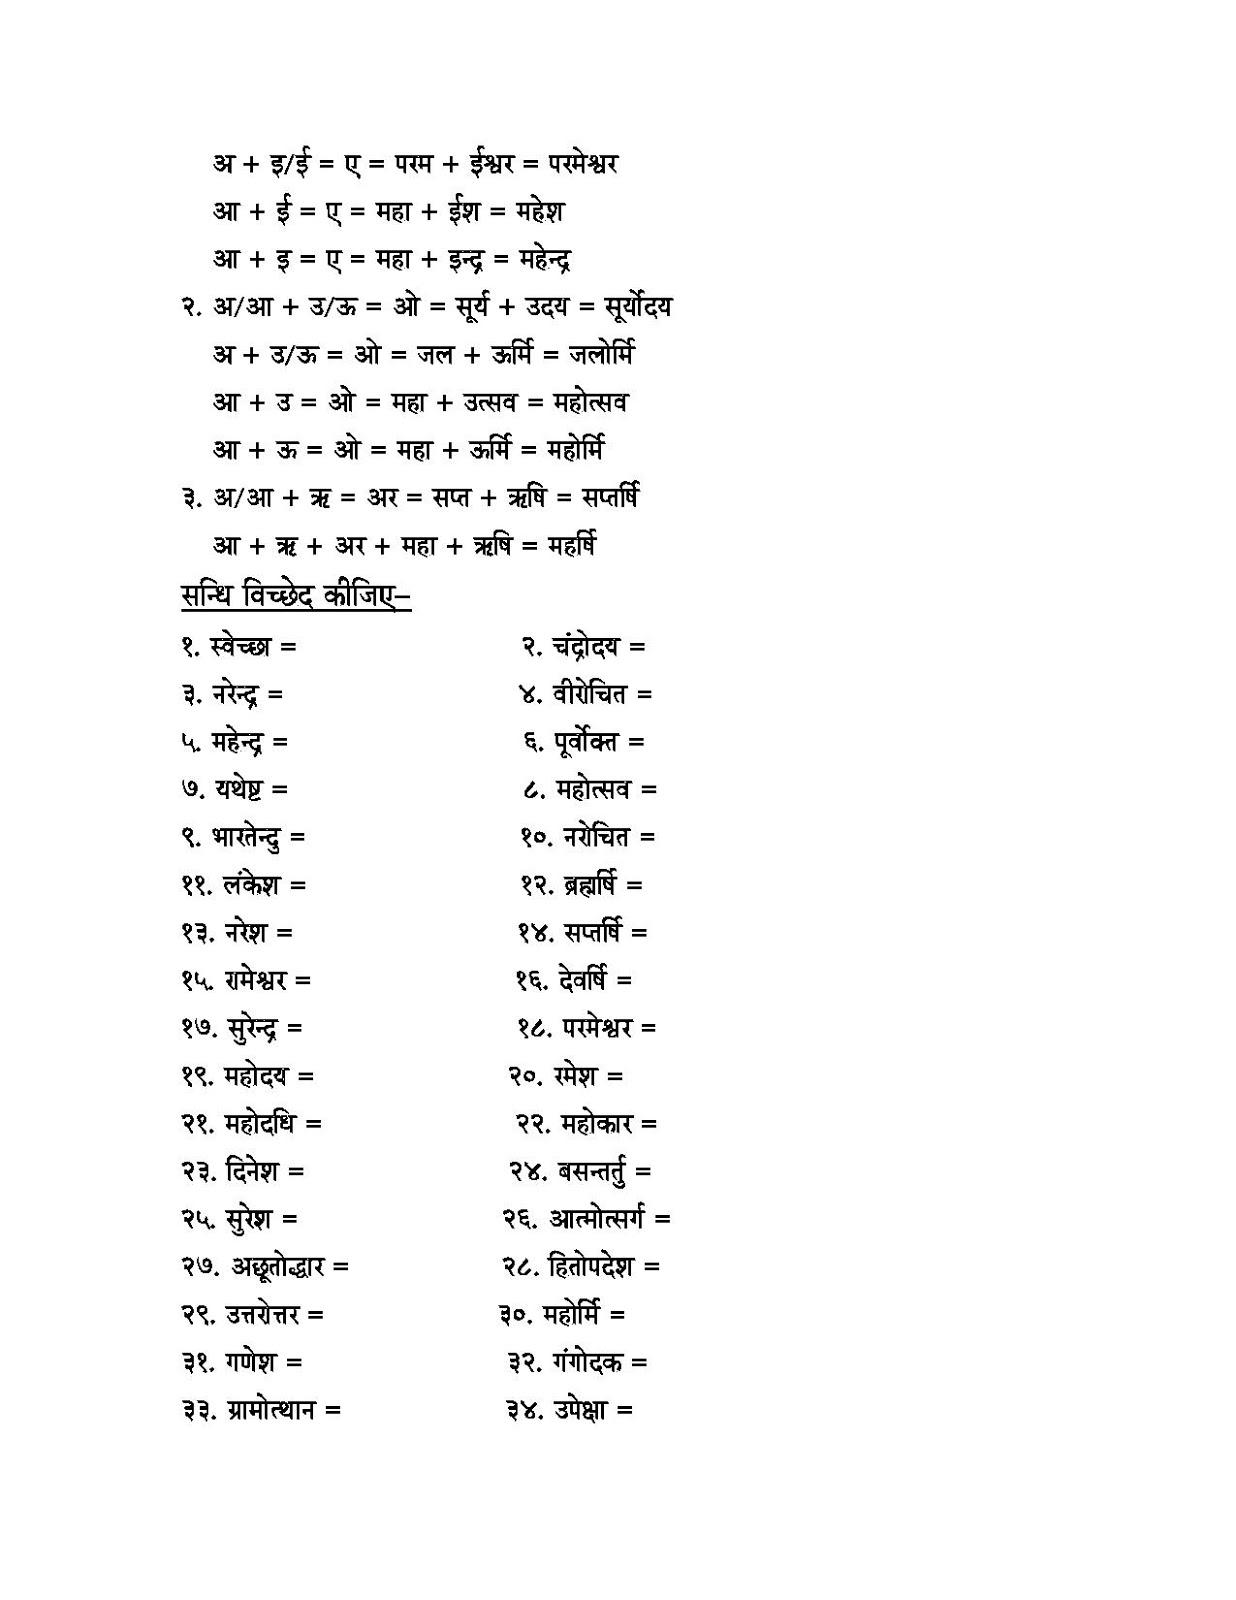 medium resolution of Karak Worksheet For Class 5 - Awesome Worksheet